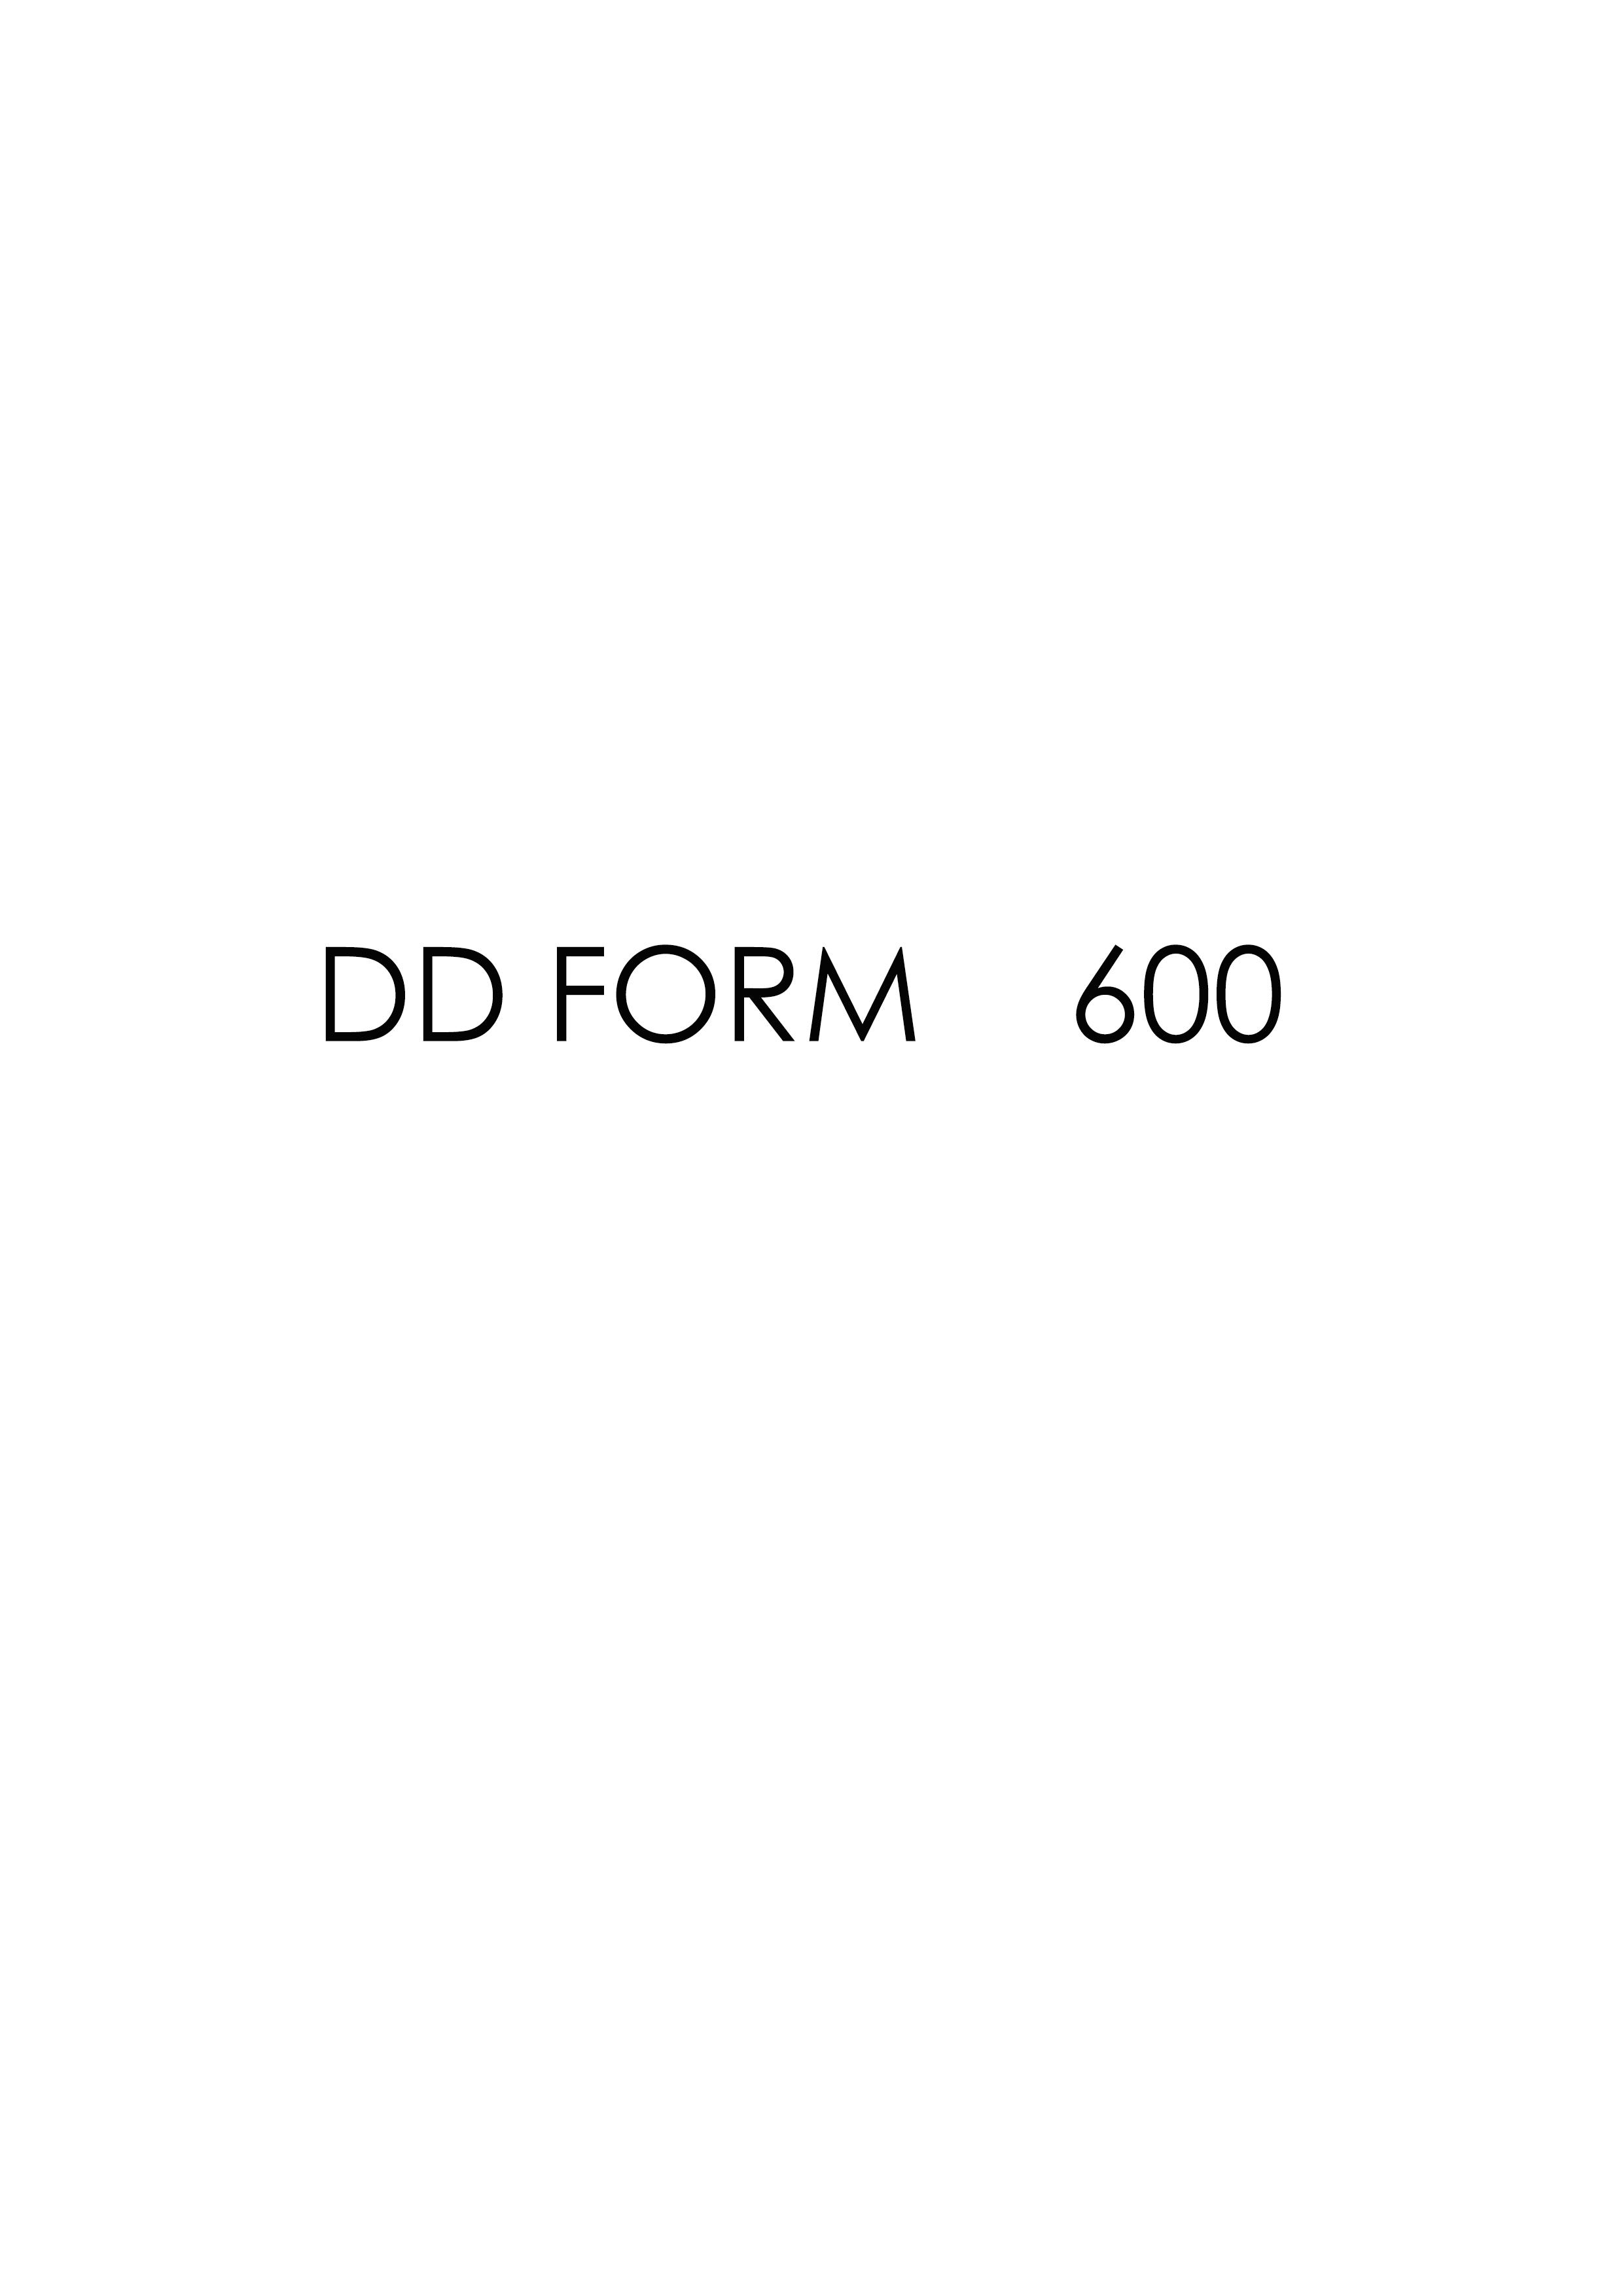 Download dd Form 600 Free